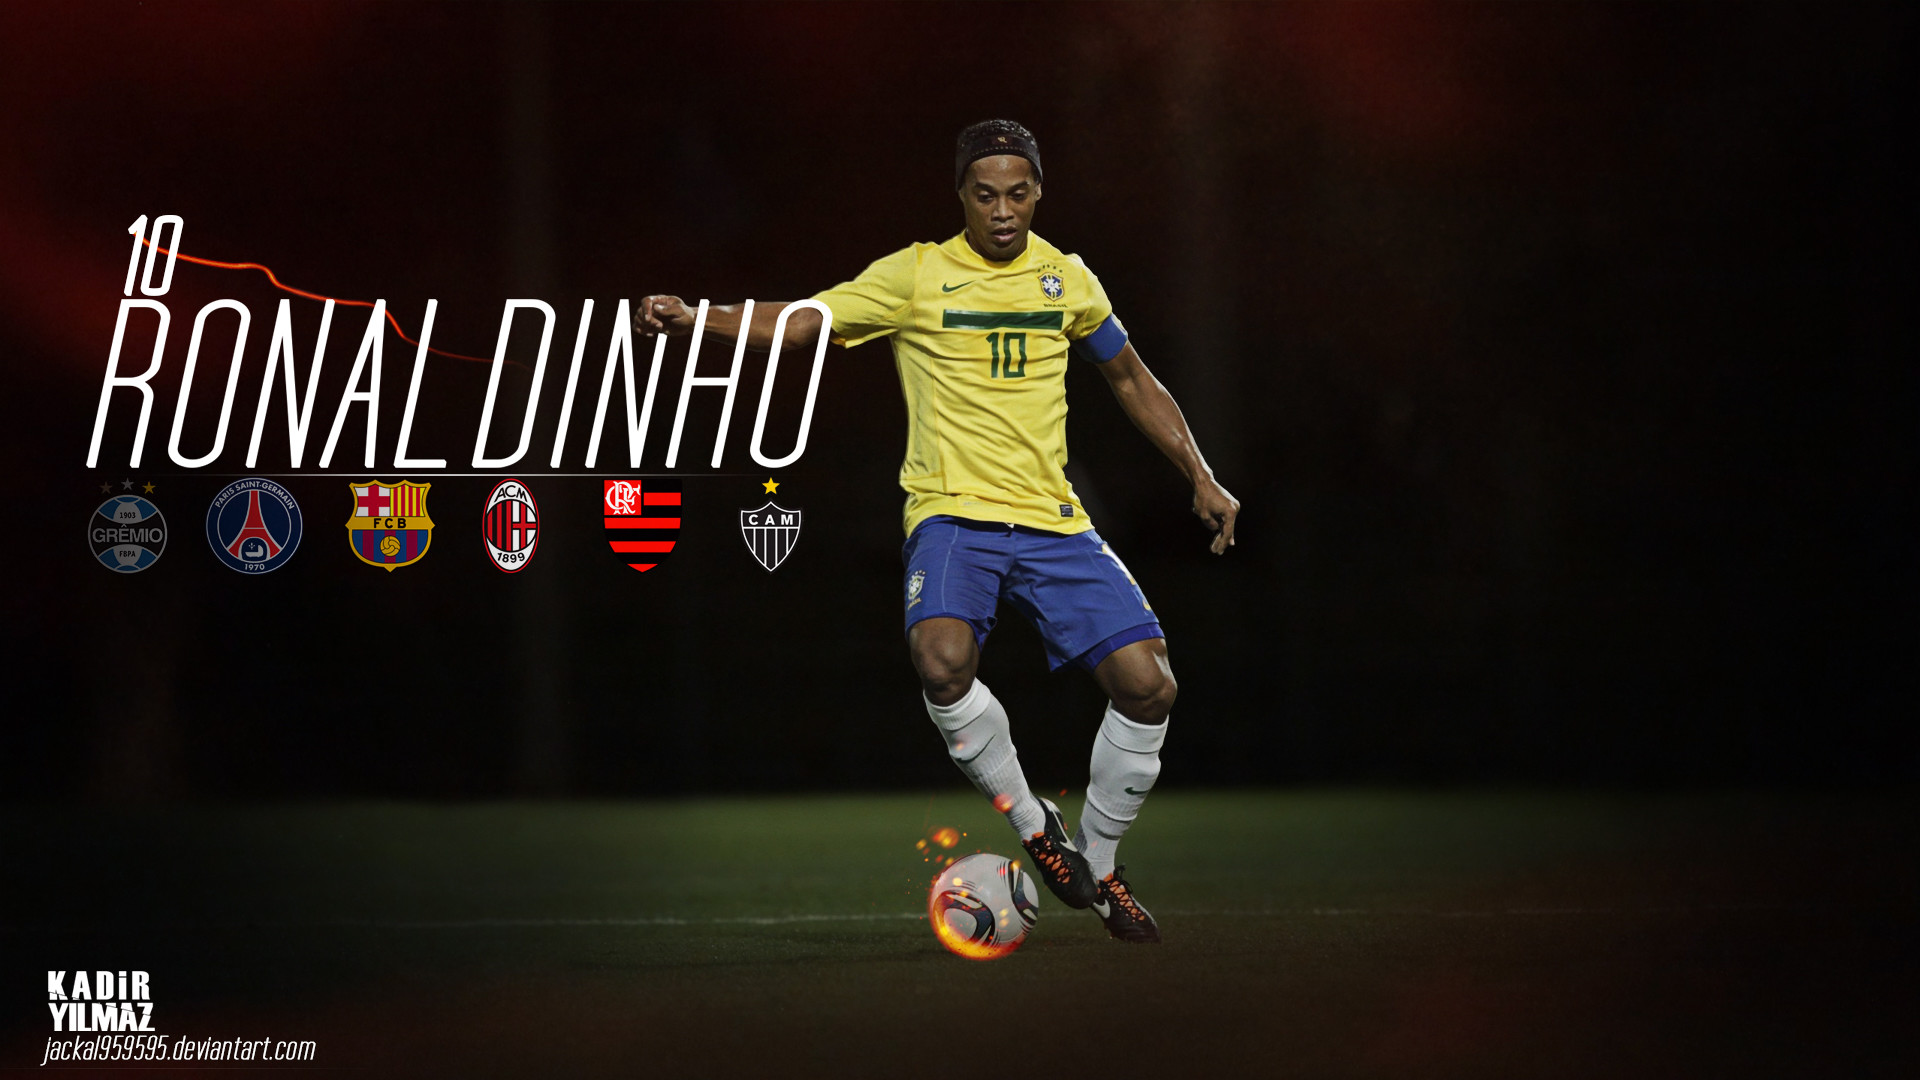 Ronaldinho Wallpapers ①